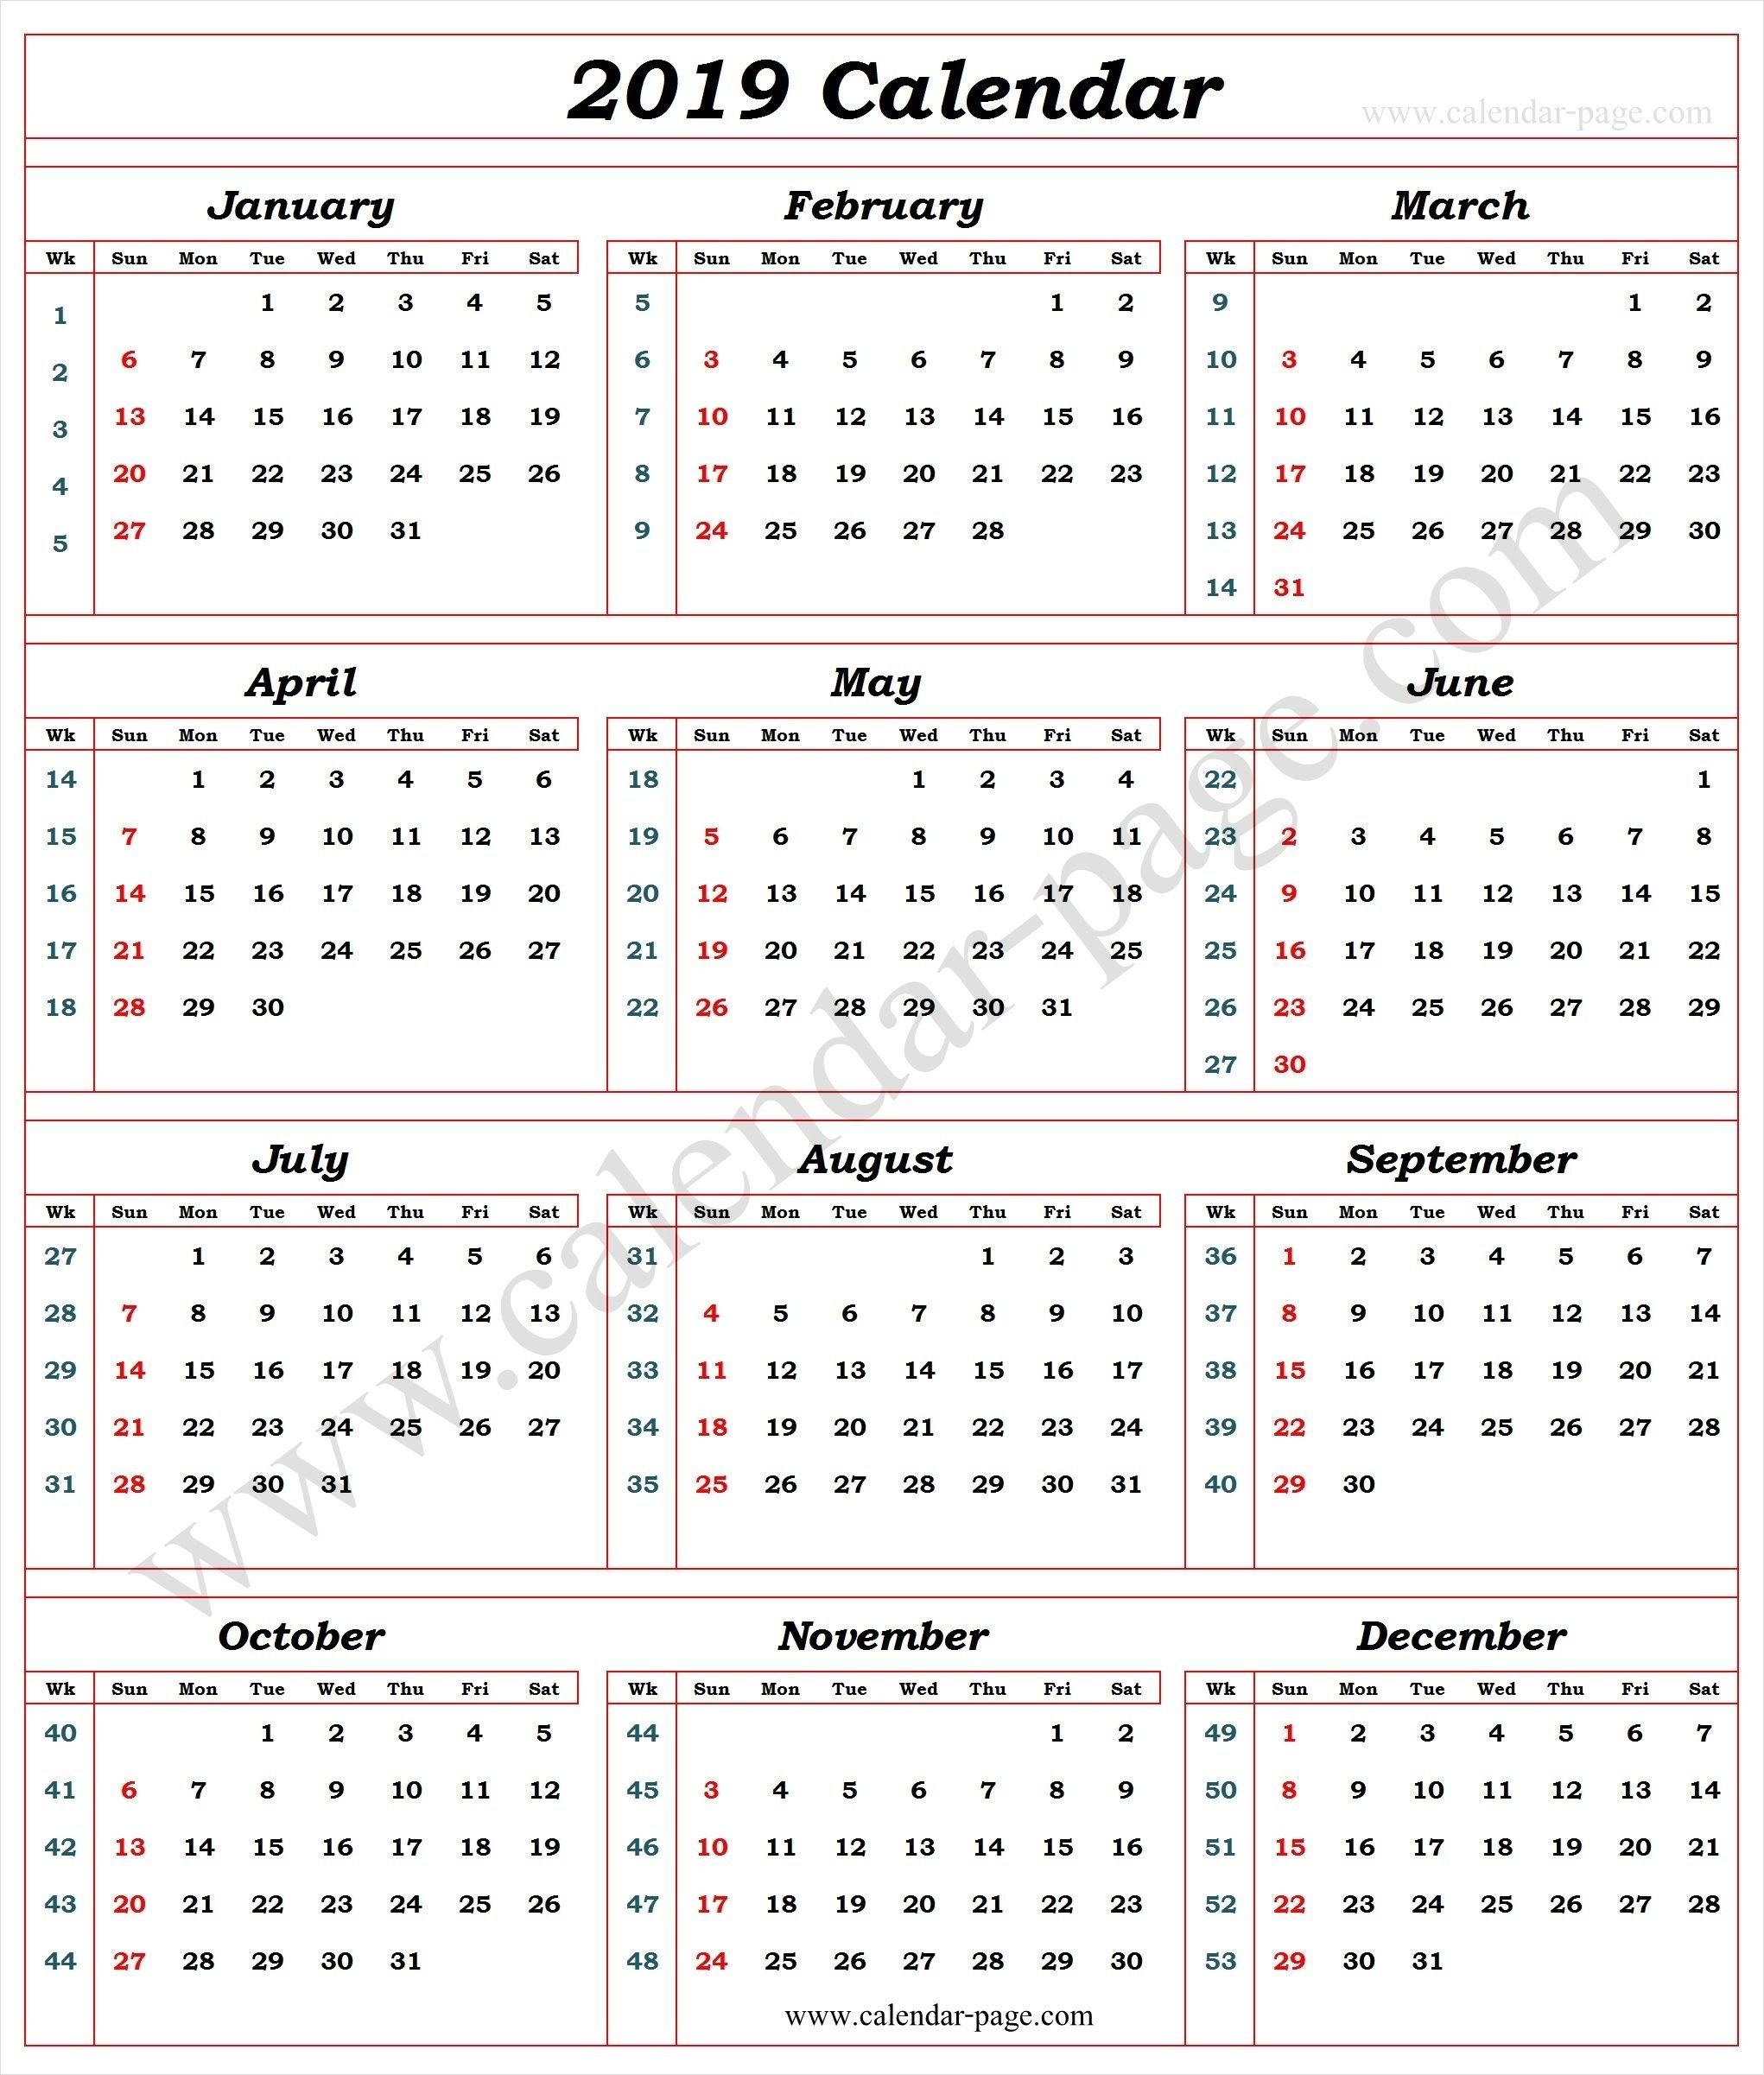 Calendar 2019 With Week Numbers | 2019 Calendar Template | Pinterest Week 7 Calendar 2019